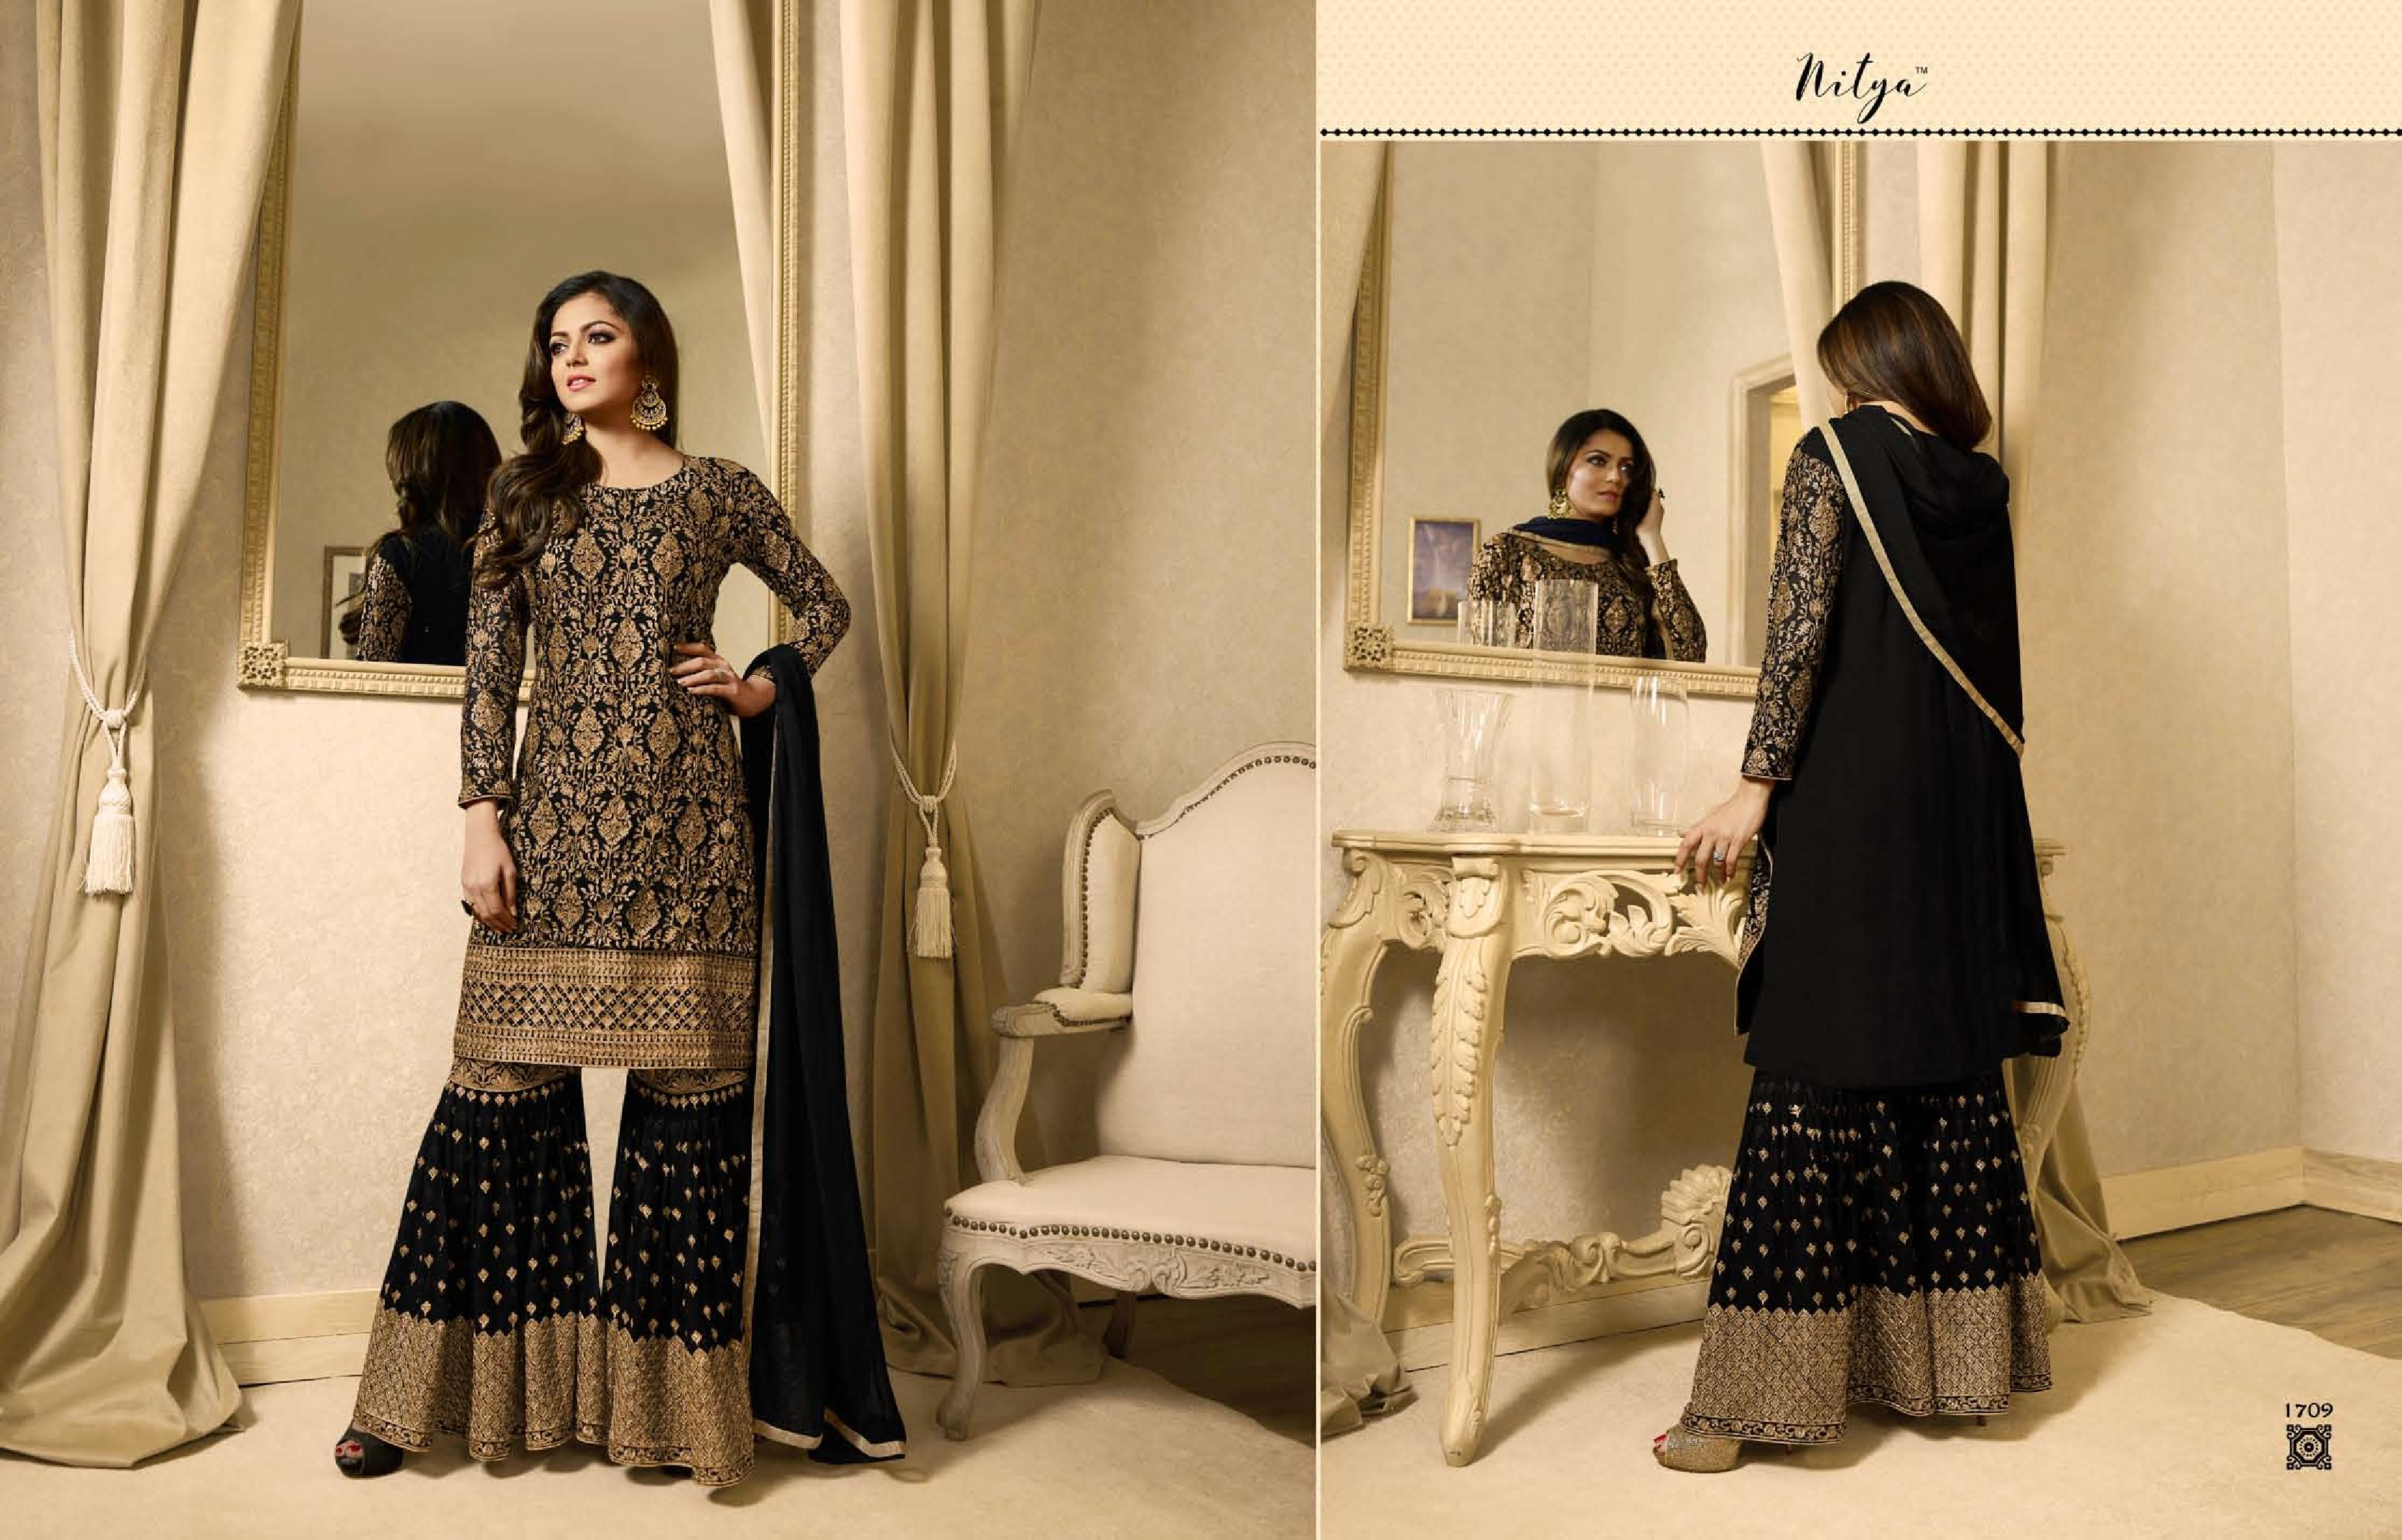 LT Fabrics Nitya 1709